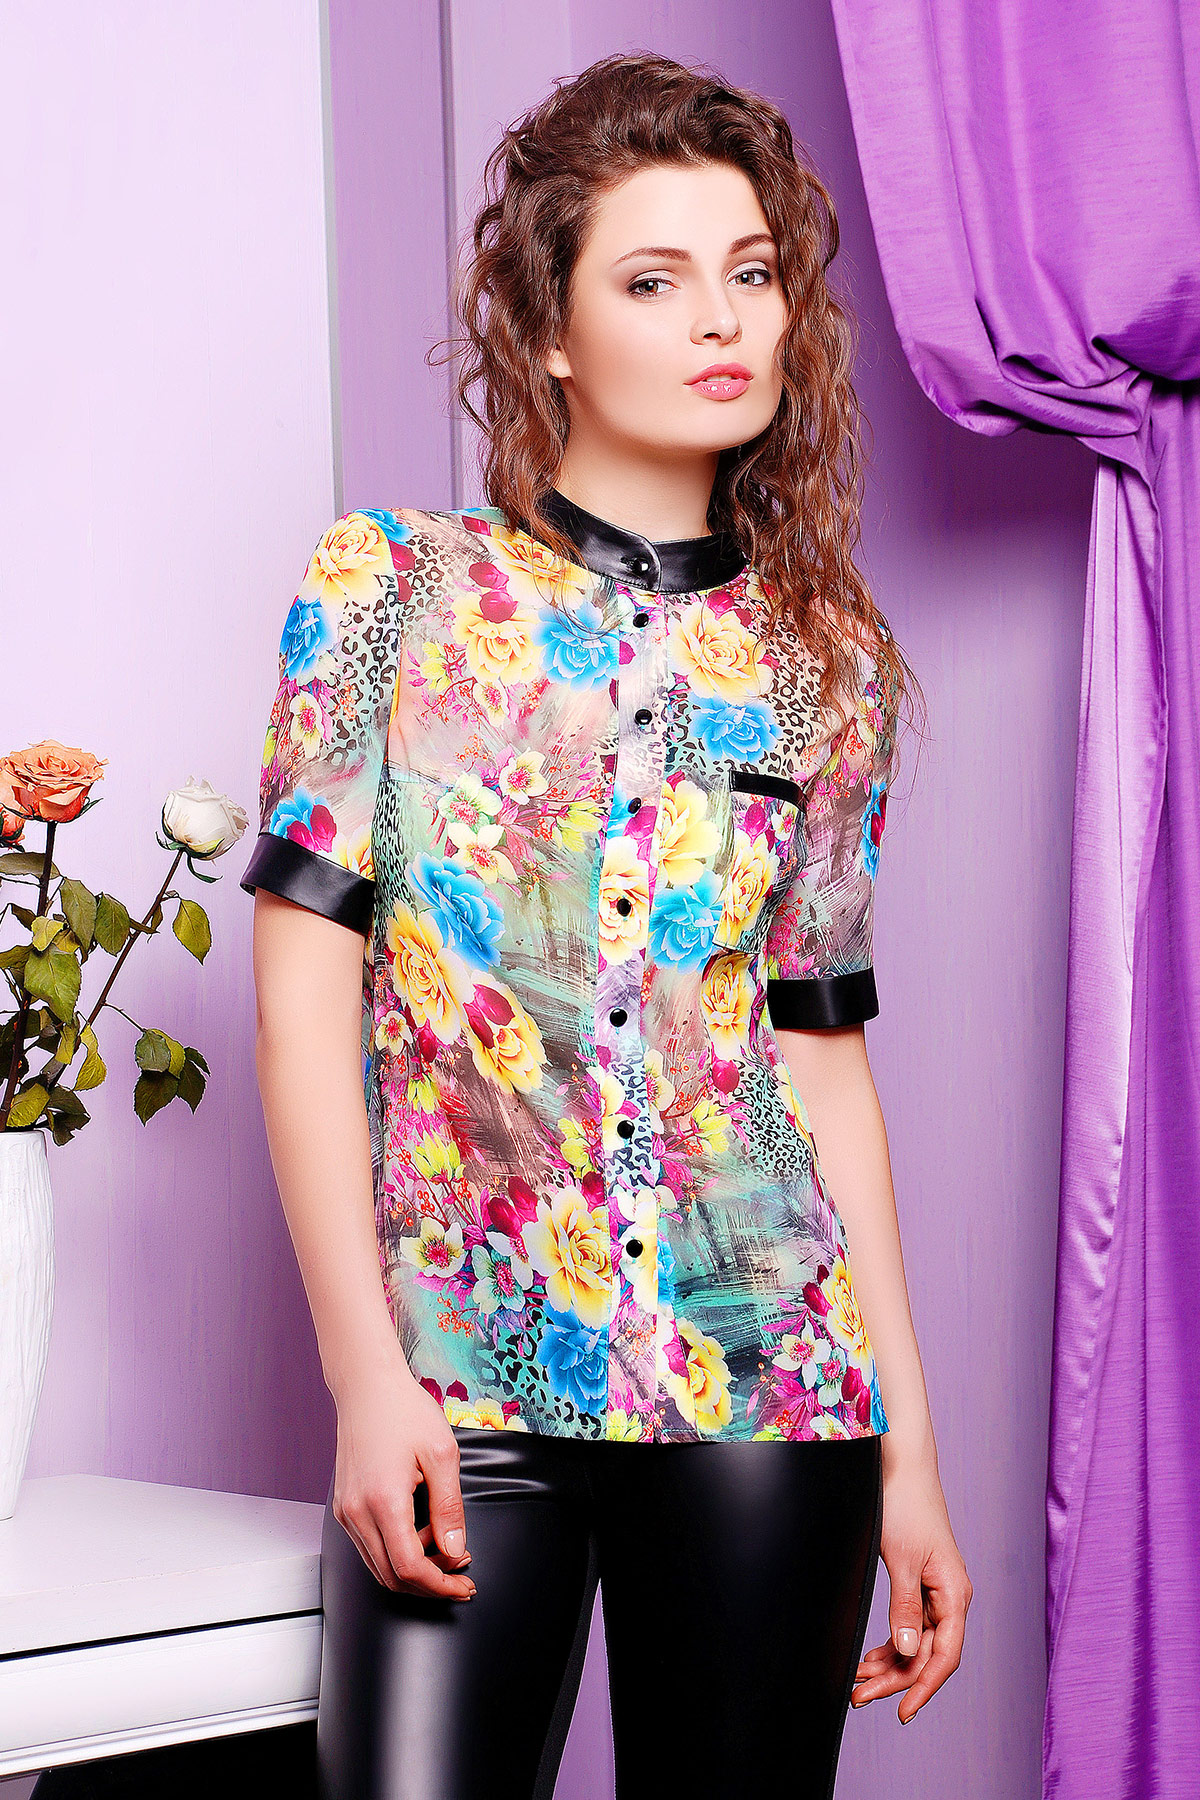 d0bde4e0e0e блузка из цветного шифона с коротким рукавом. блуза Микс к р. Цвет